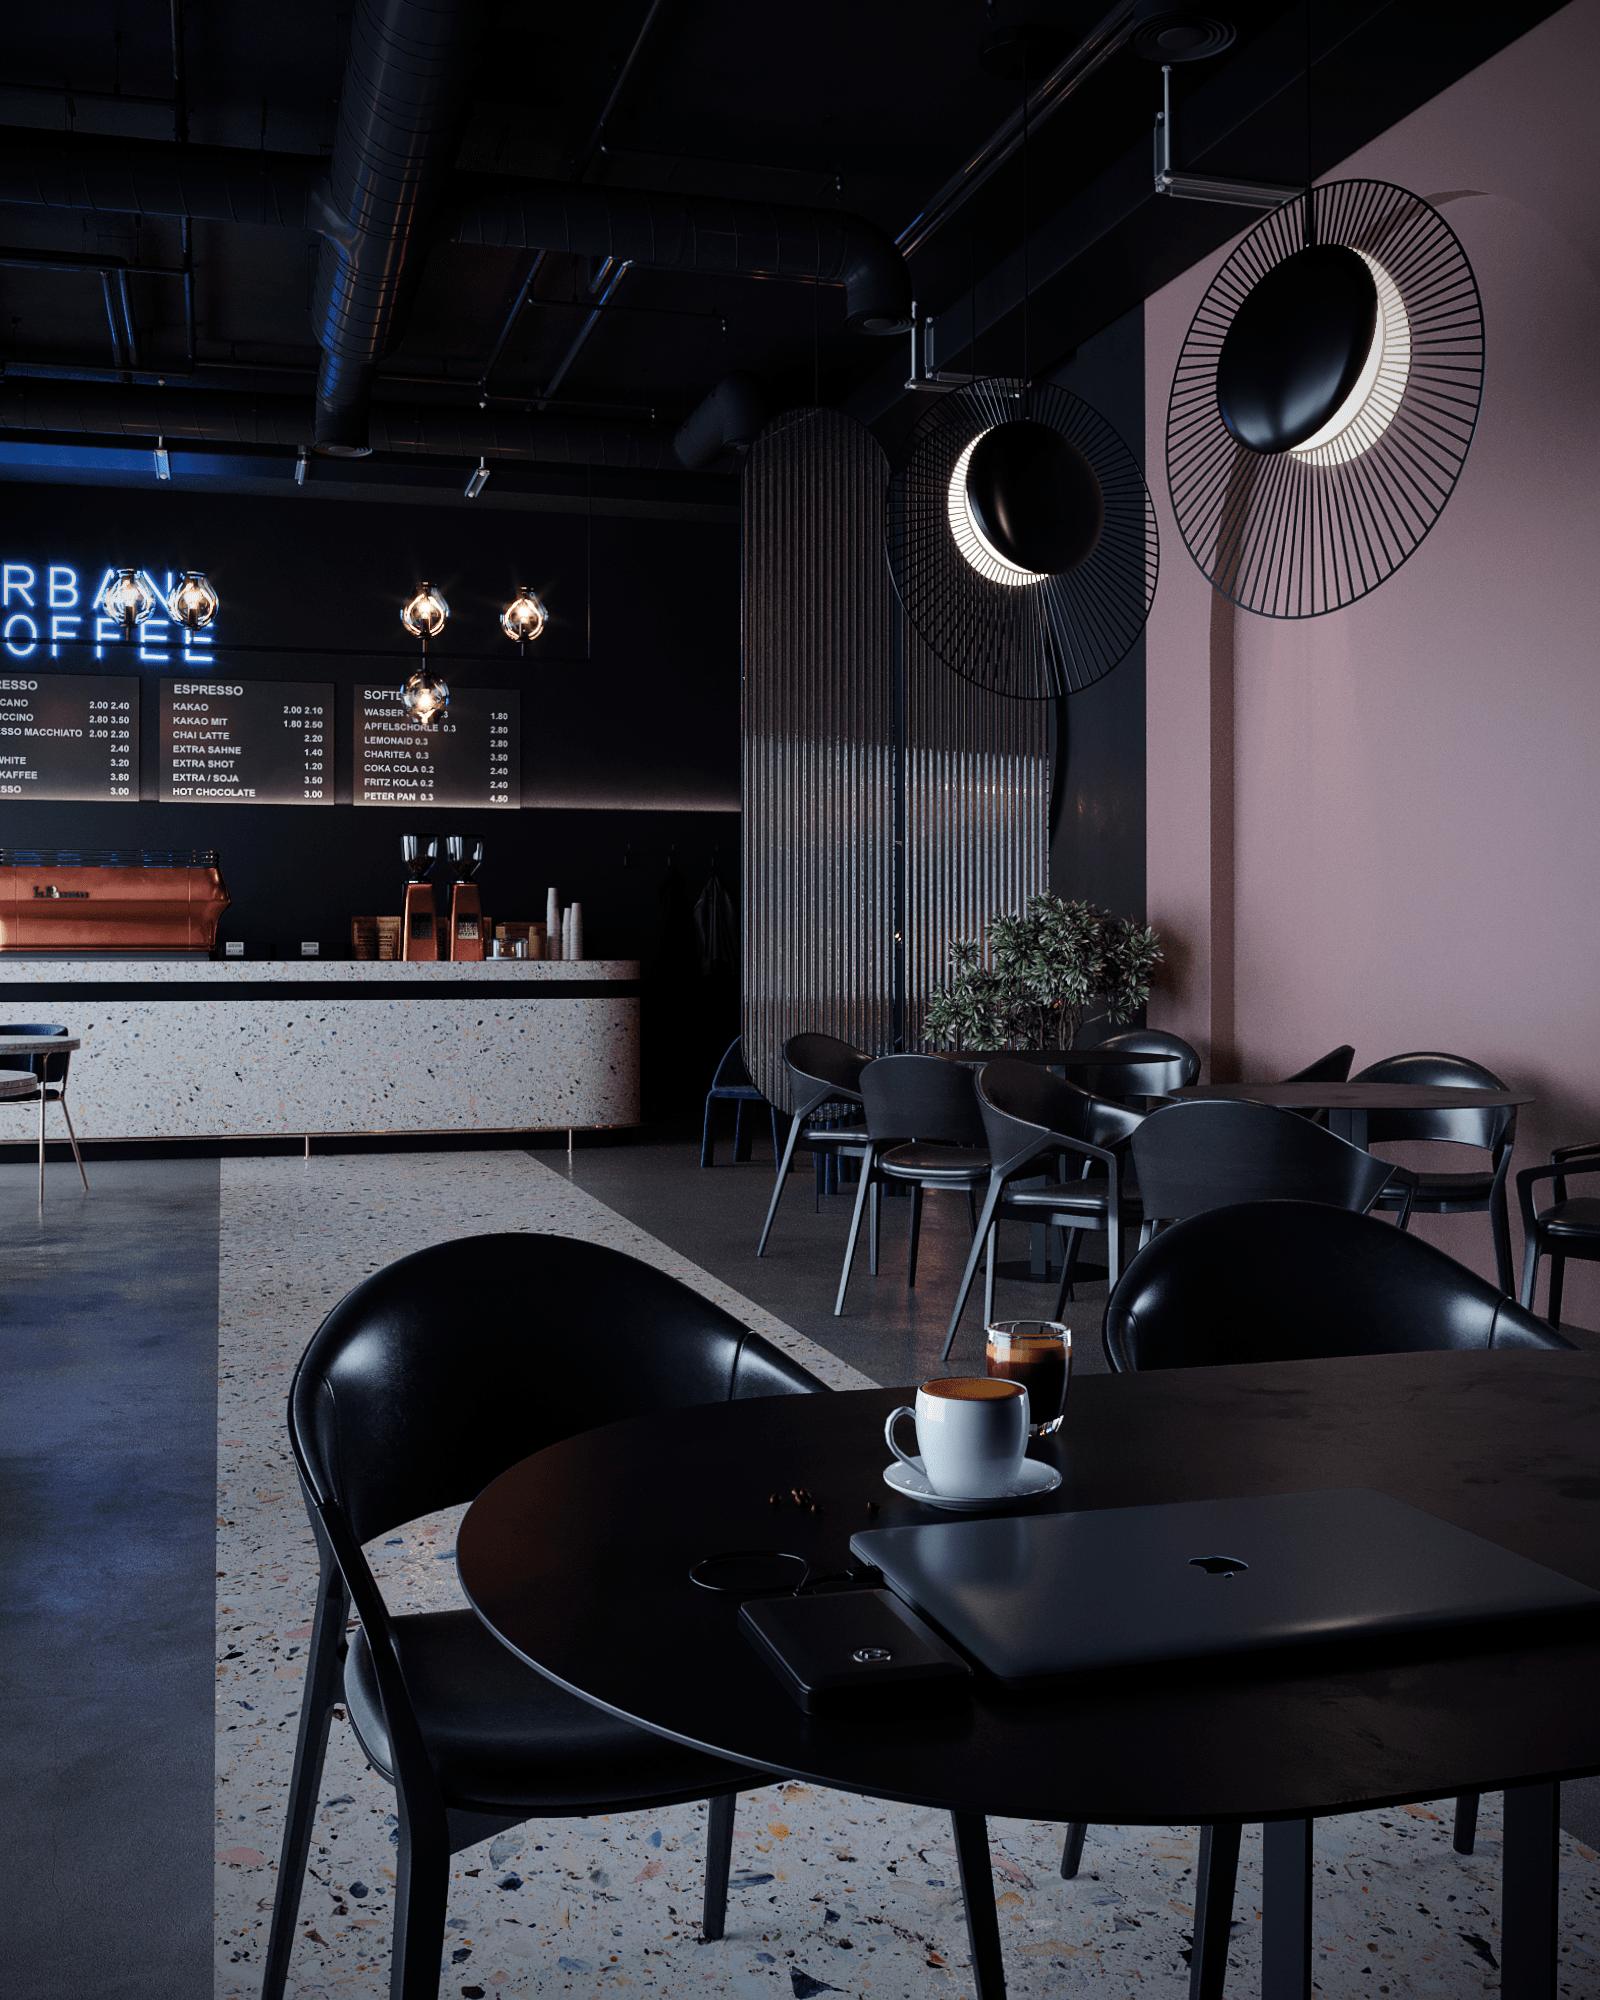 https://studioautograph.com/wp-content/uploads/2021/02/studio-autograph-ltd-berlin-design-cafe3-min.png